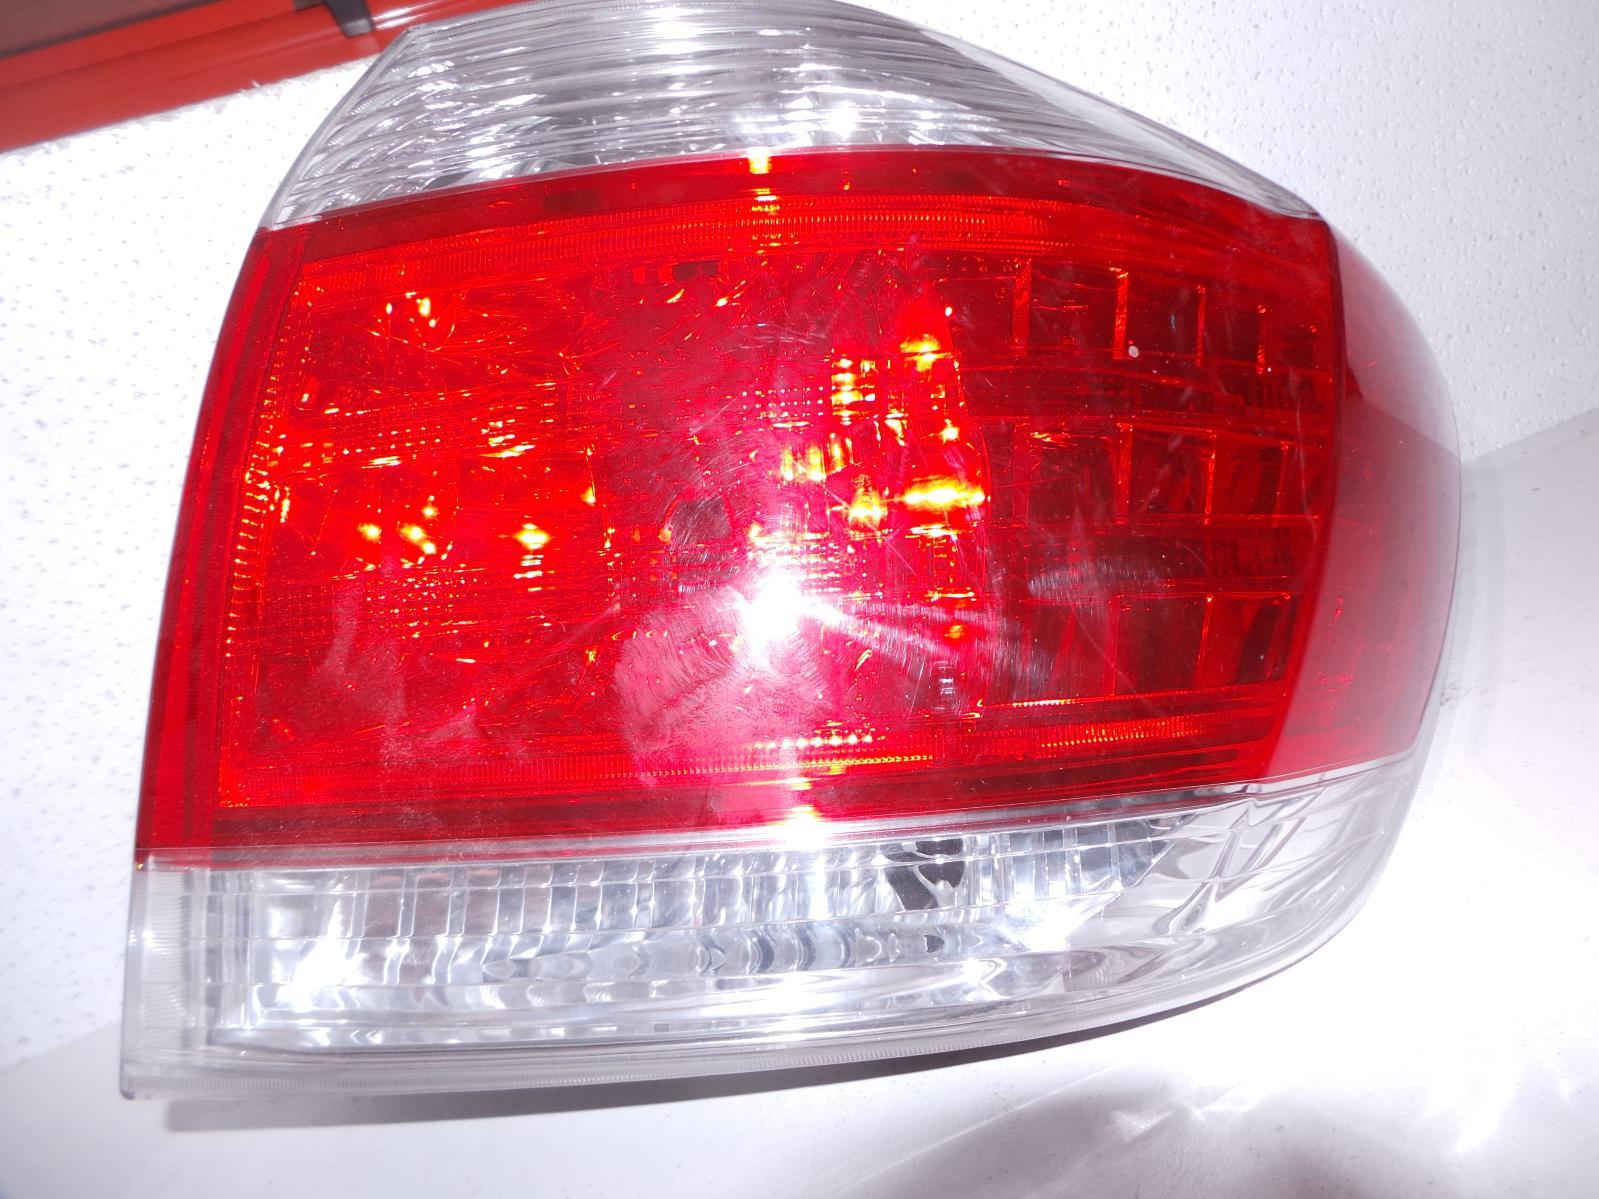 TOYOTA KLUGER, Right Taillight, GSU40-GSU45, IN BODY, 07/10-02/14